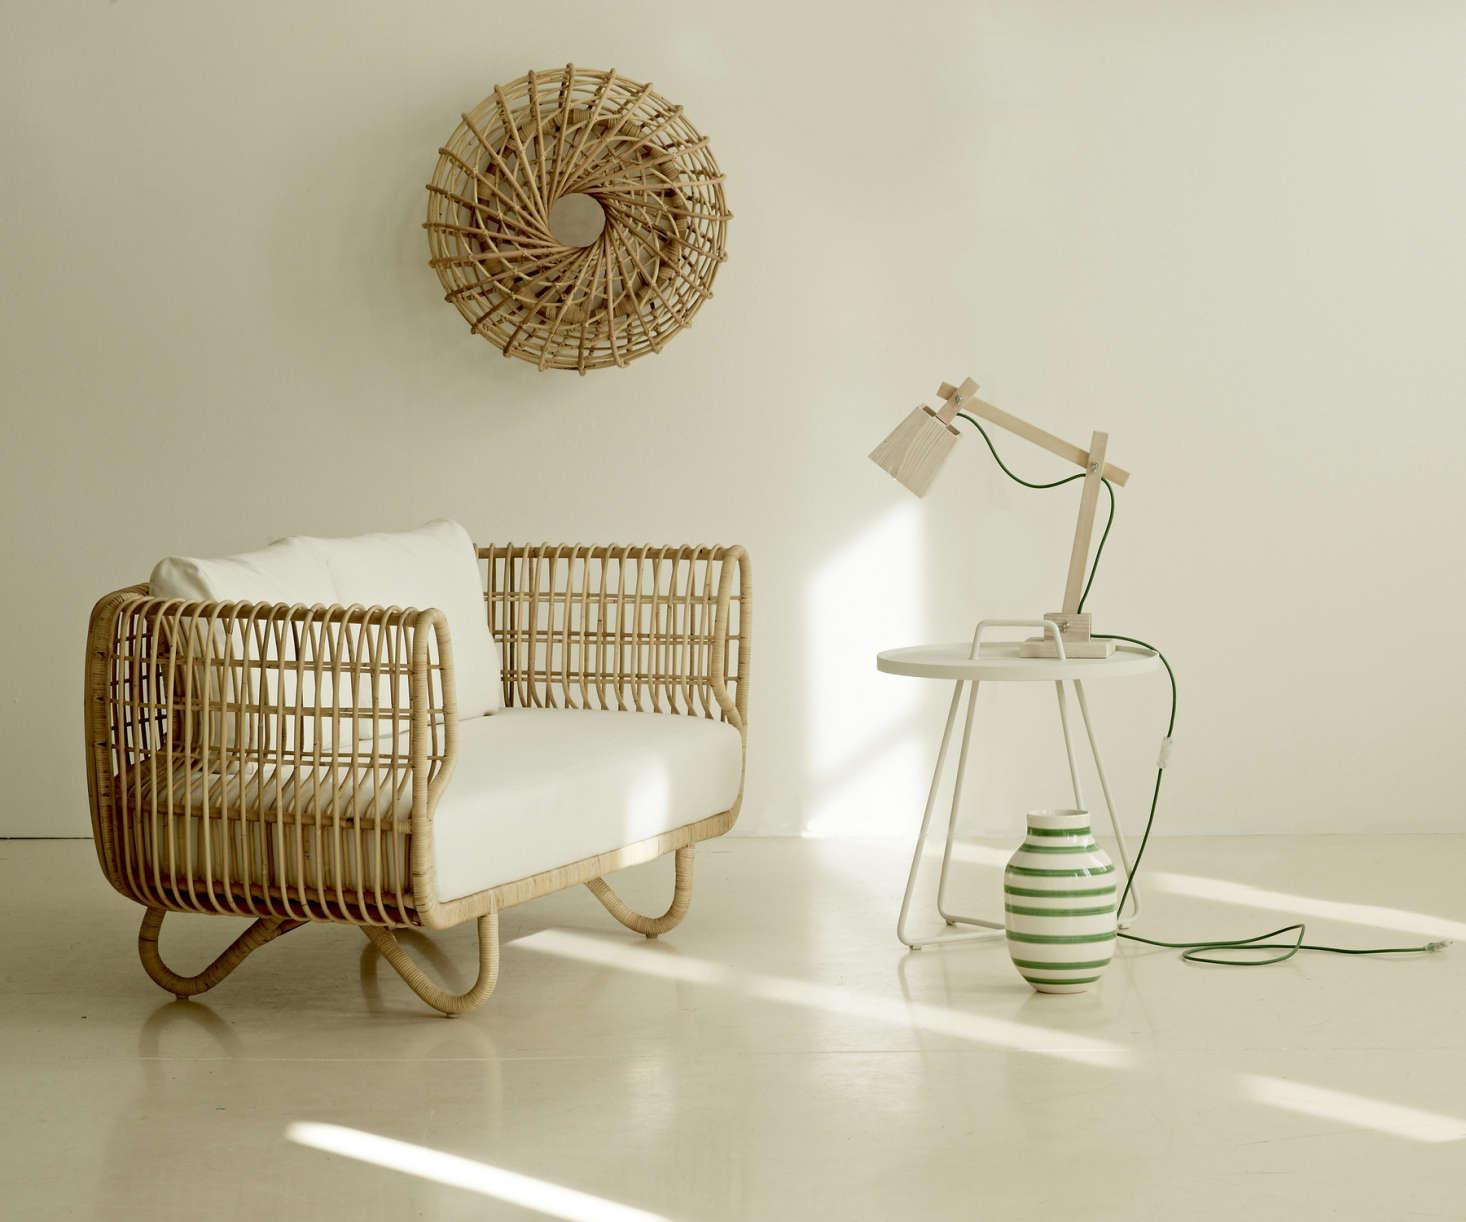 Foersom & Hiort Lorenzen Nest Sofa